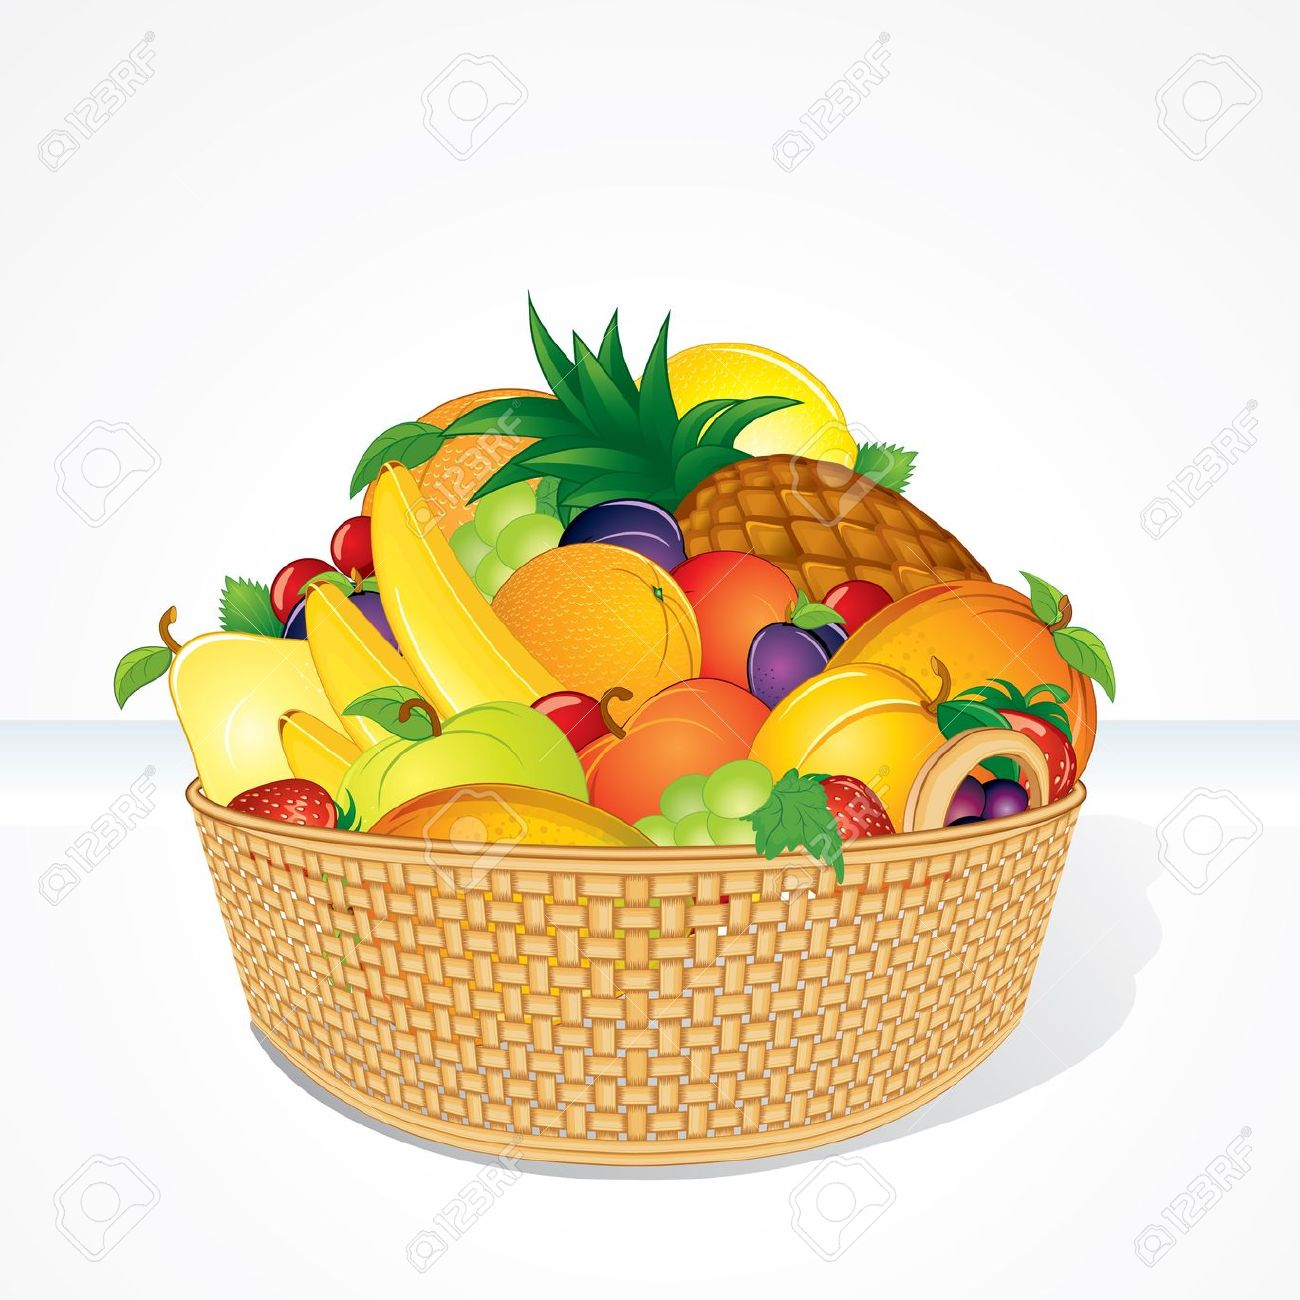 Orange fruit pencil and. Basket clipart cartoon